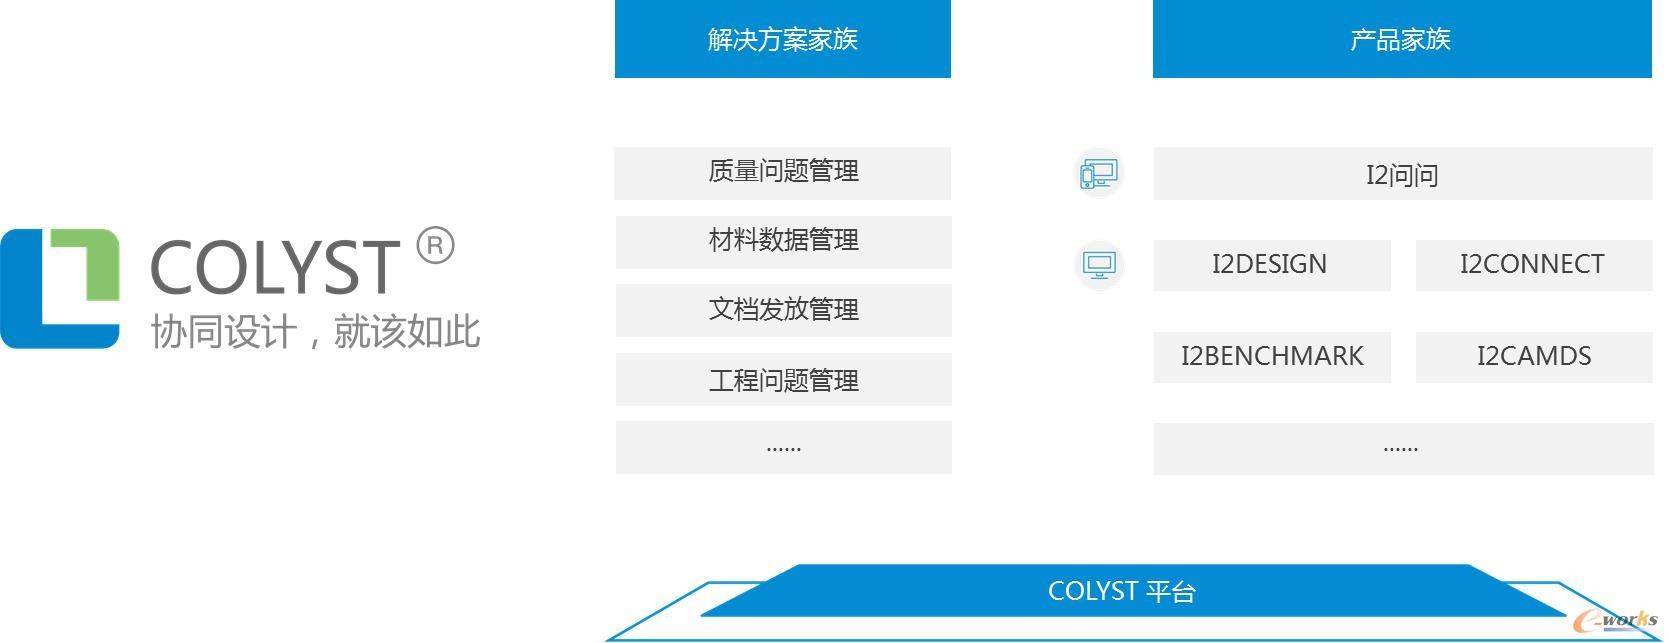 自主品牌COLYST